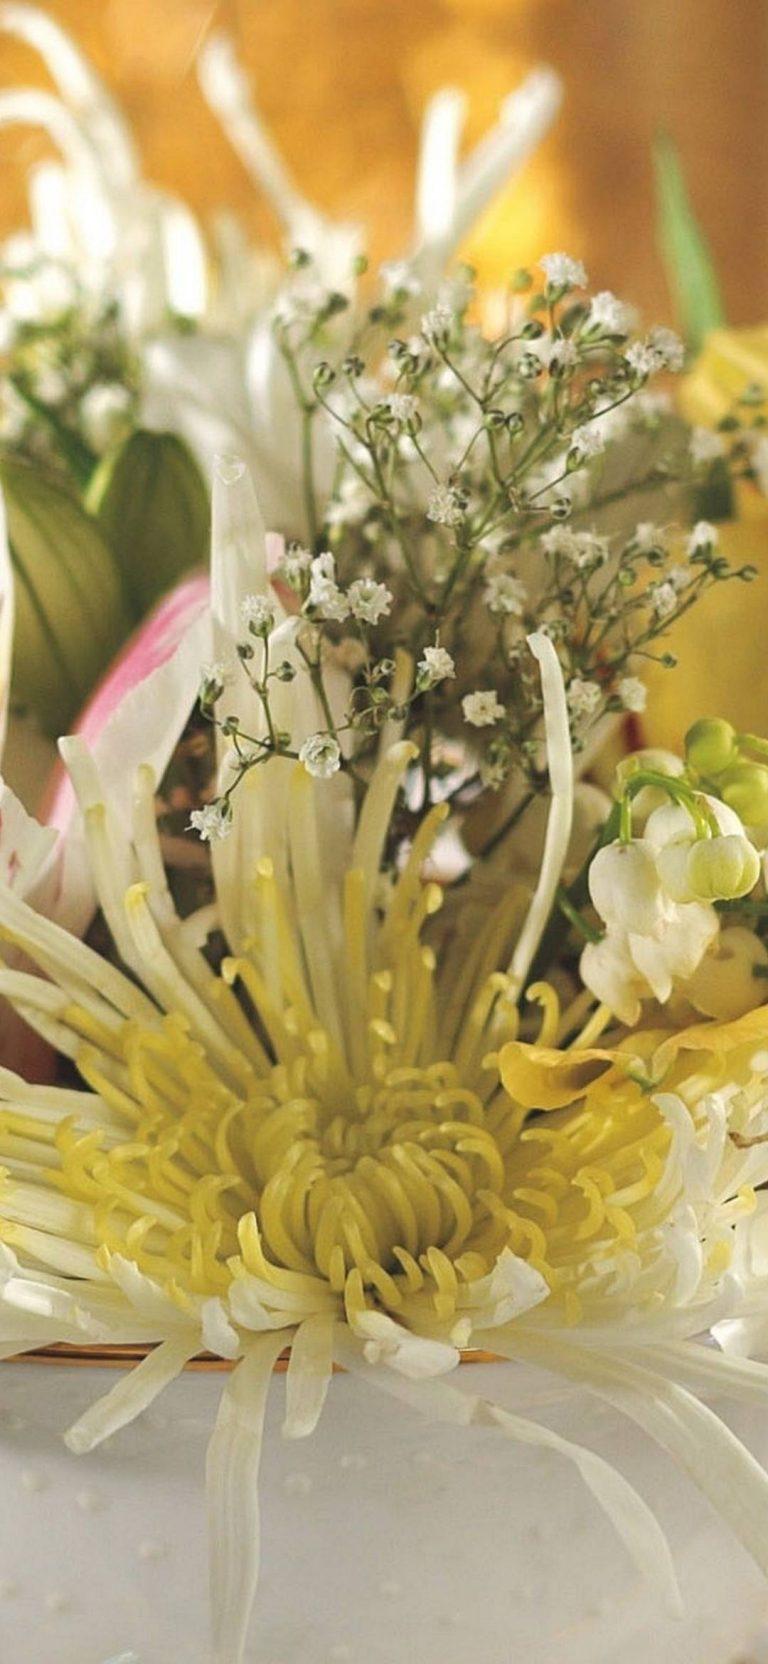 Bouquet Flowers White 1080x2340 768x1664